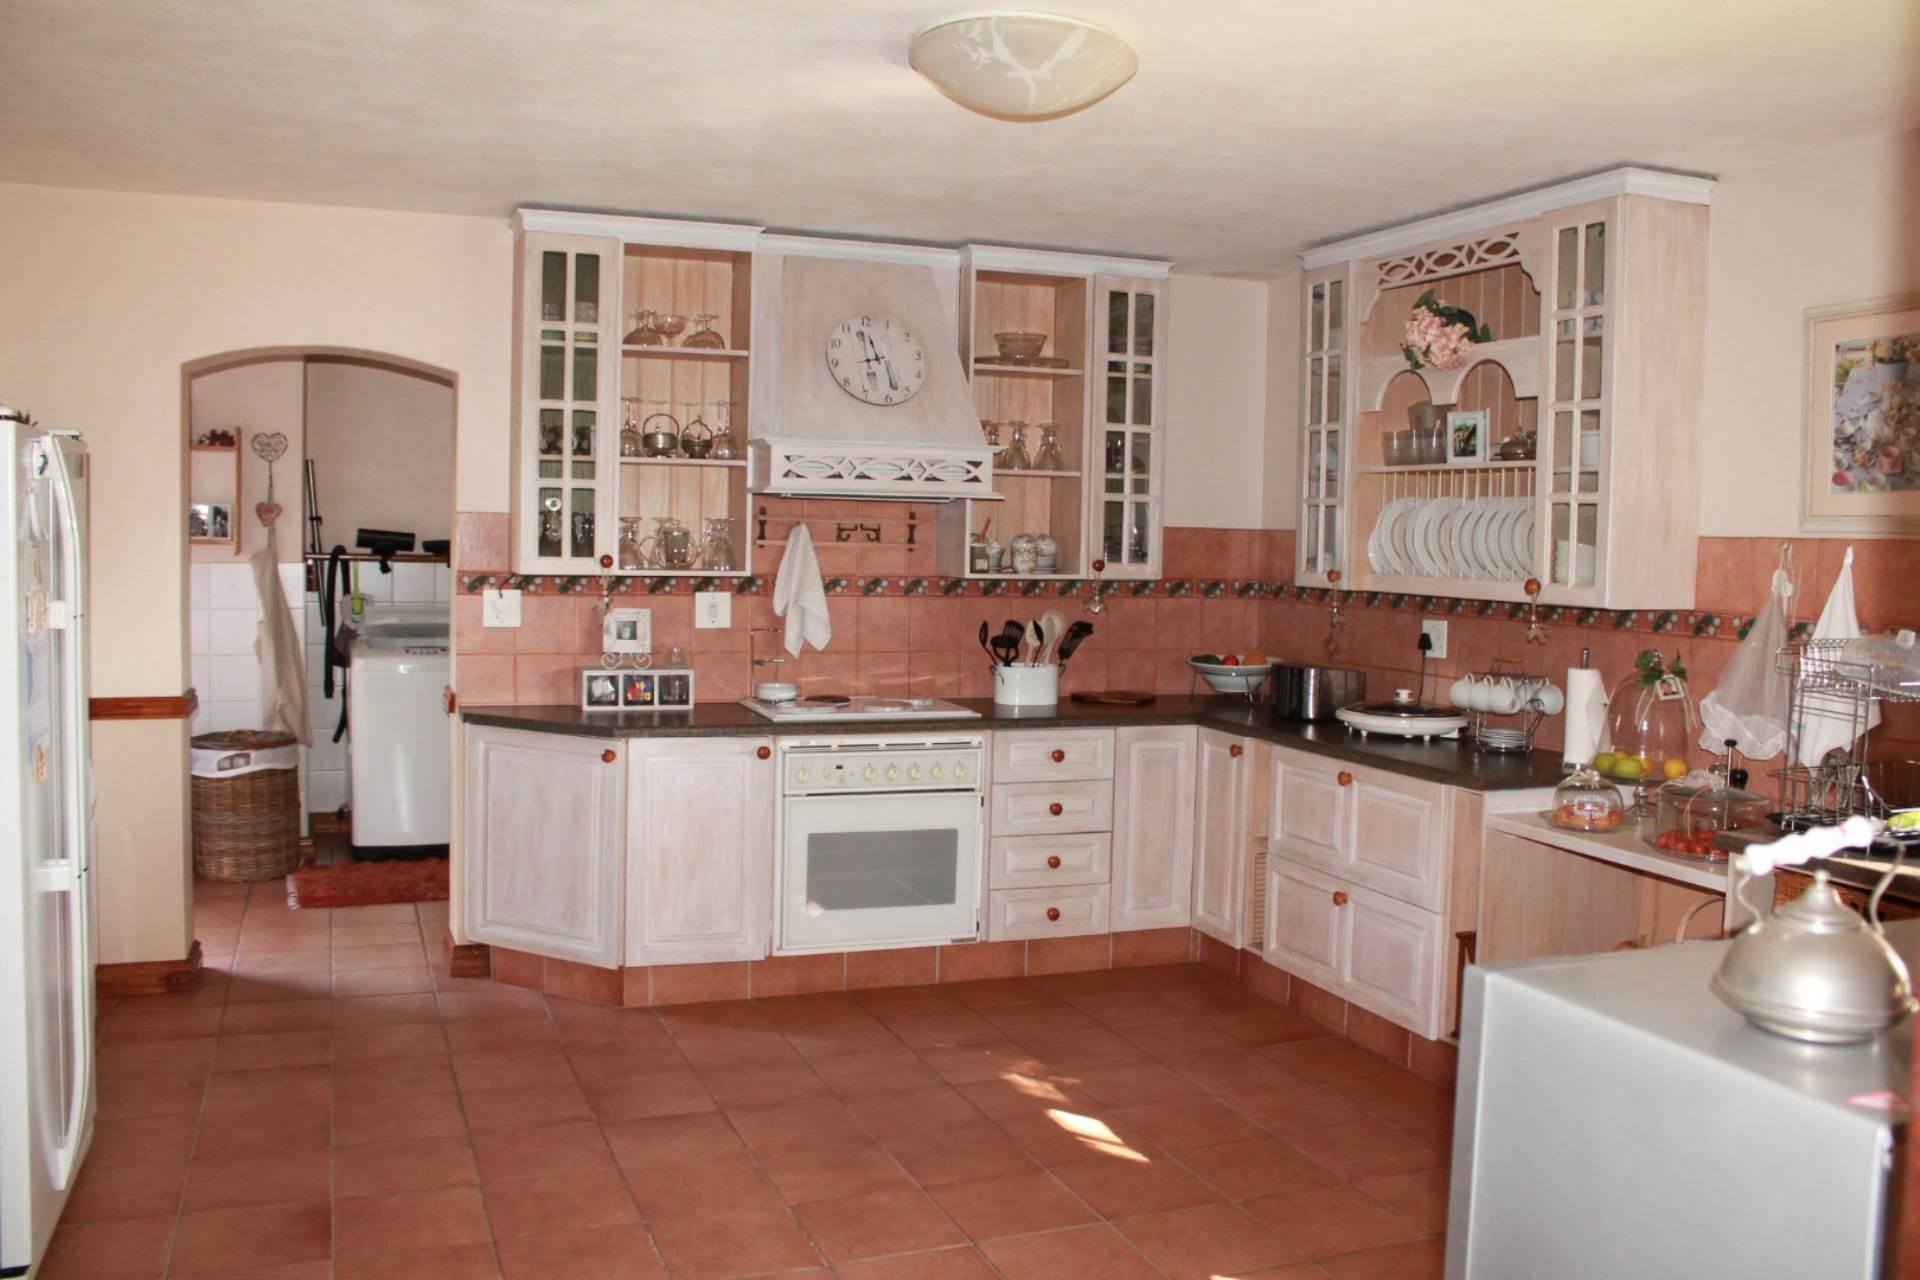 Akasia, Ninapark Property  | Houses For Sale Ninapark, NINAPARK, House 6 bedrooms property for sale Price:2,279,000